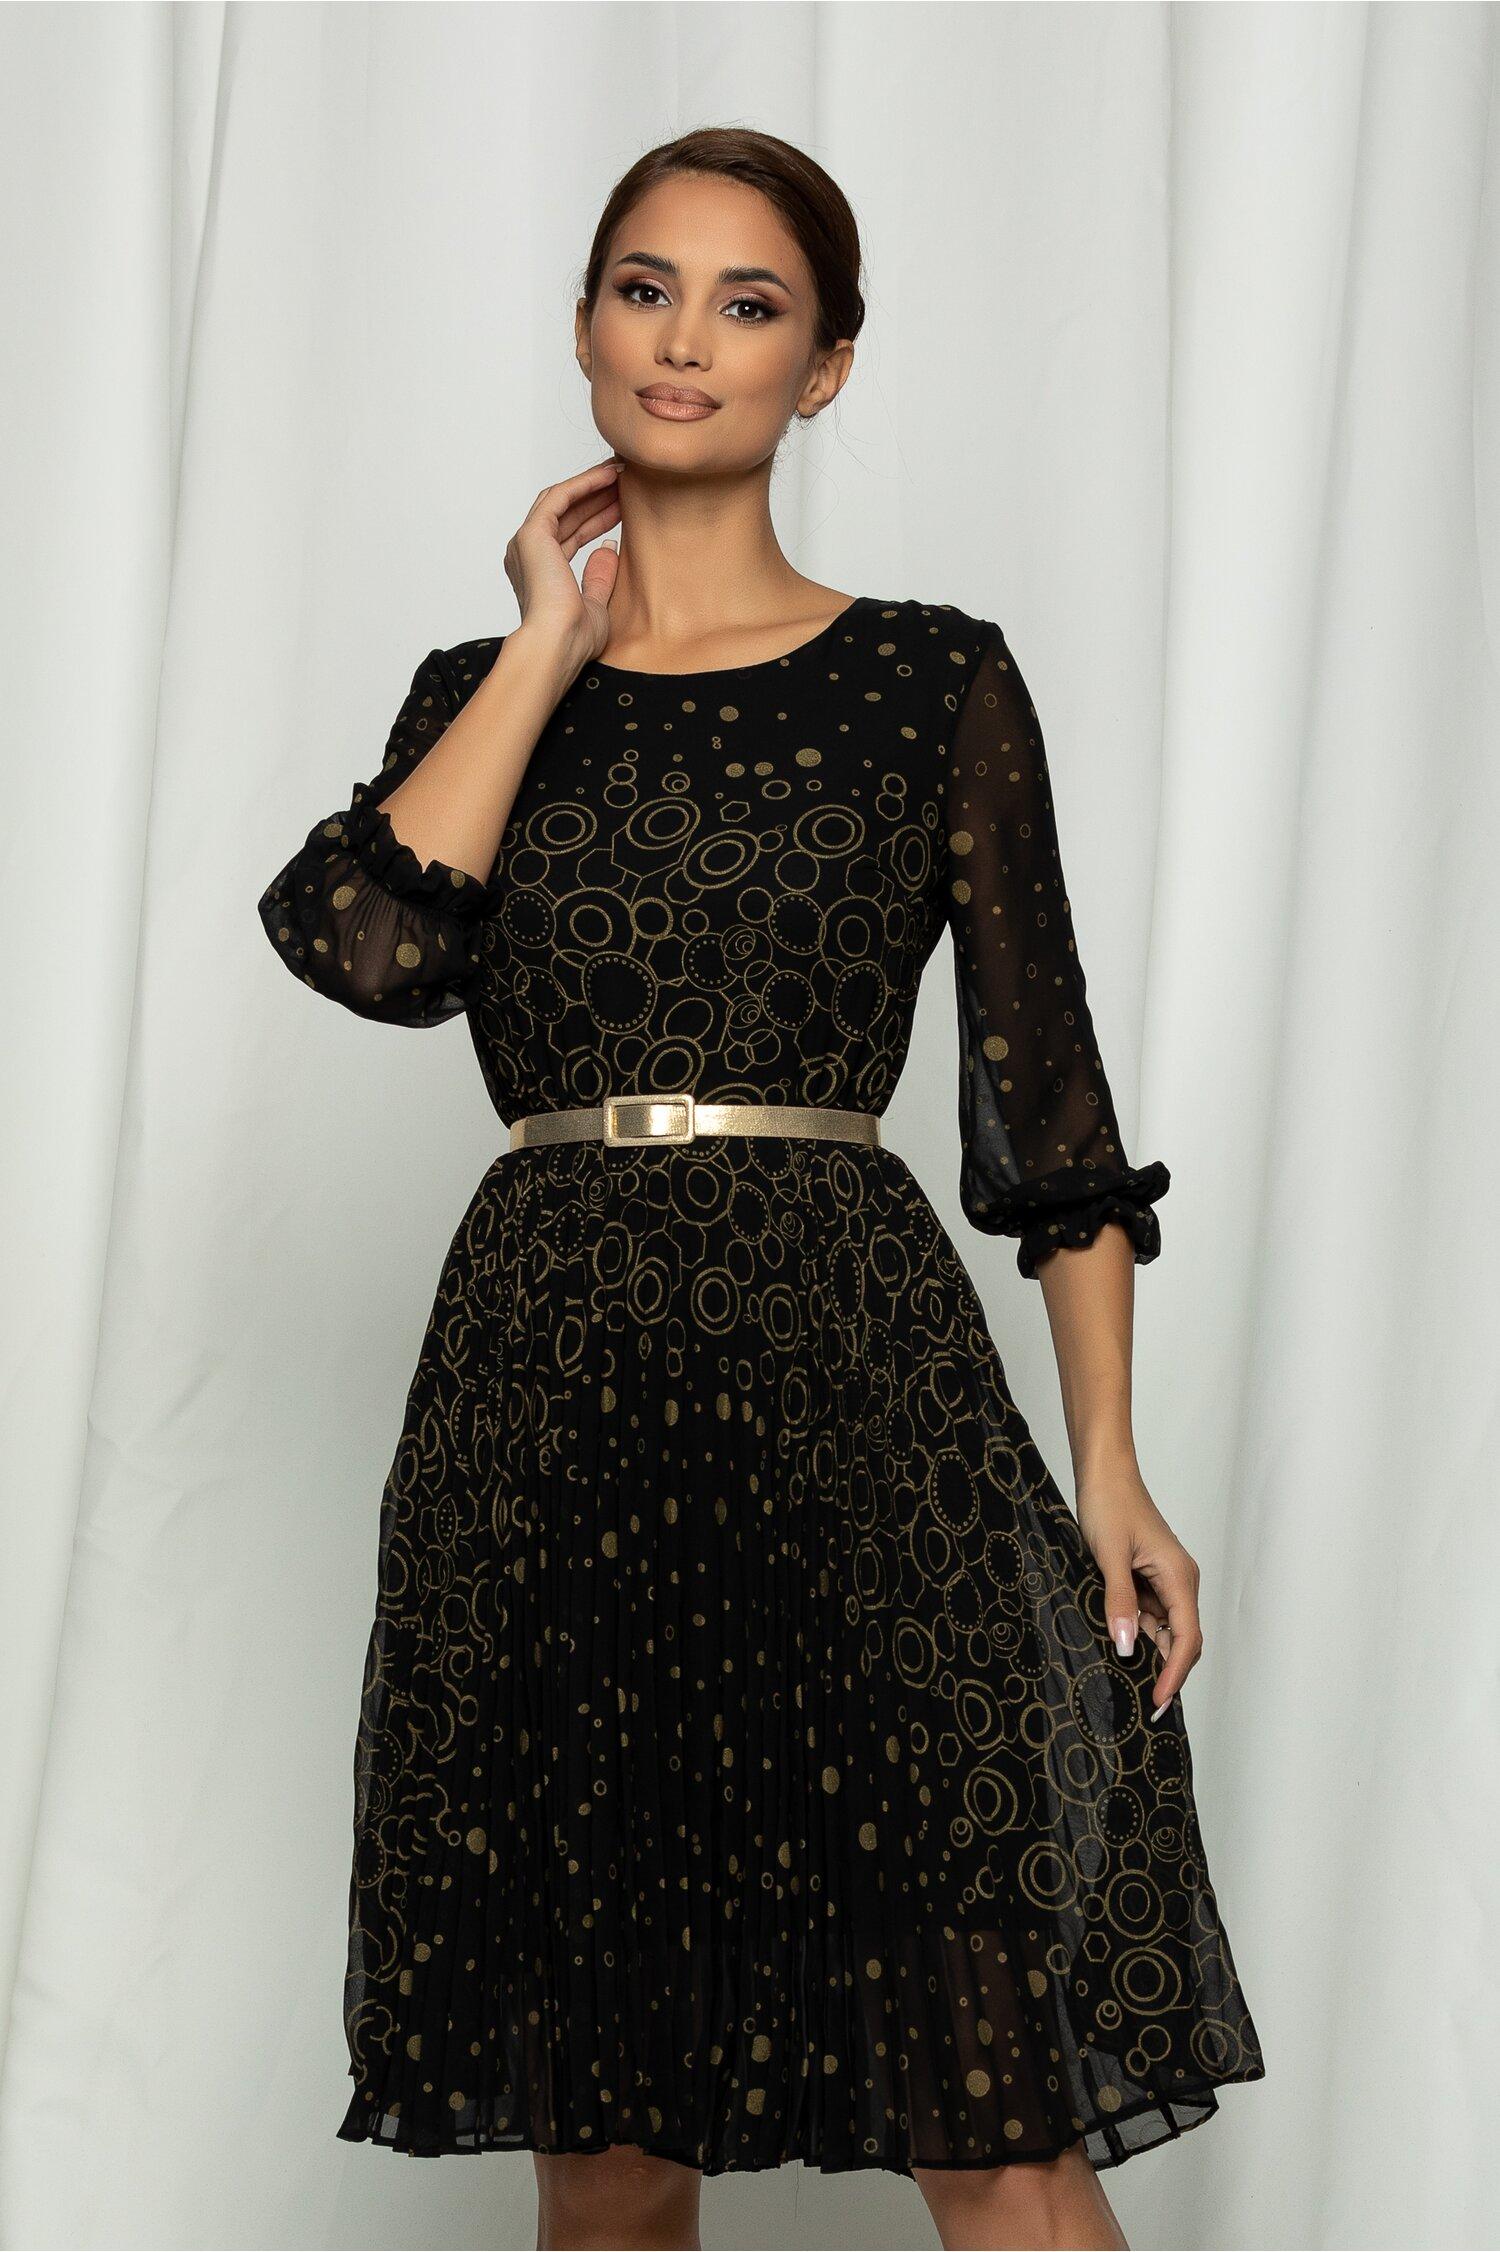 Rochie Ana neagra plisata si design cu cerculete